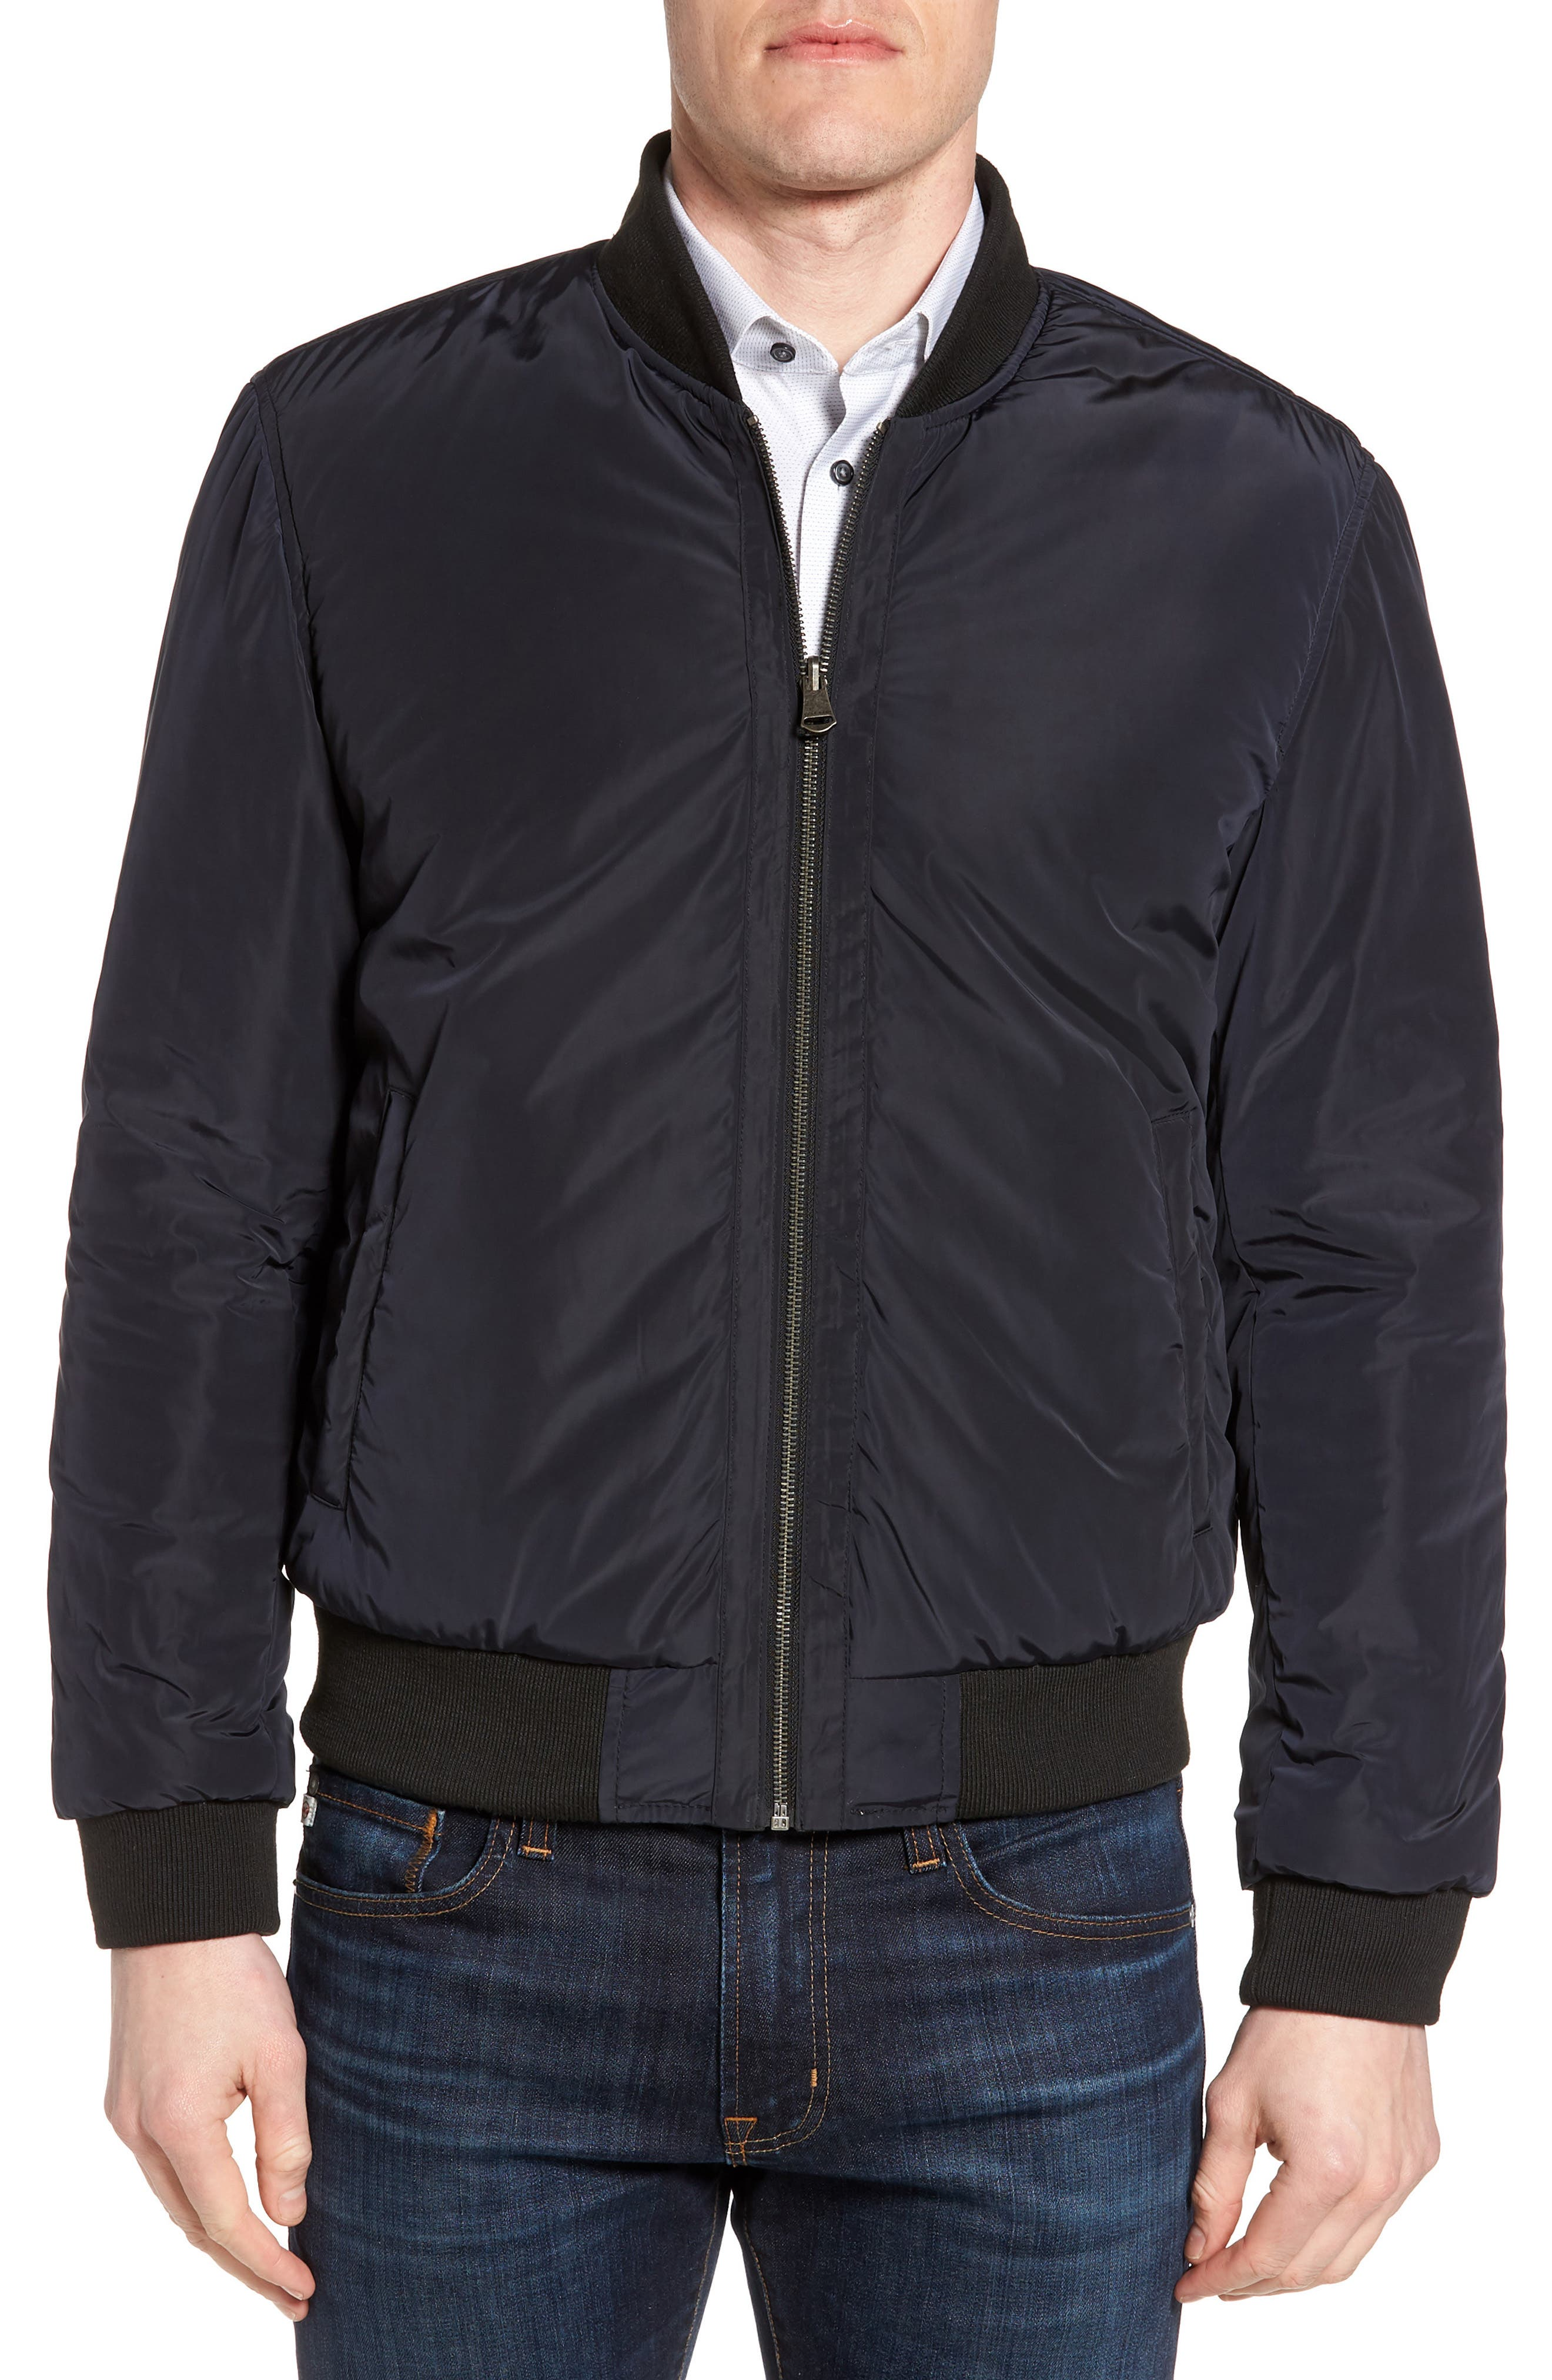 Reversible Leather Jacket,                             Alternate thumbnail 2, color,                             Black/ Navy